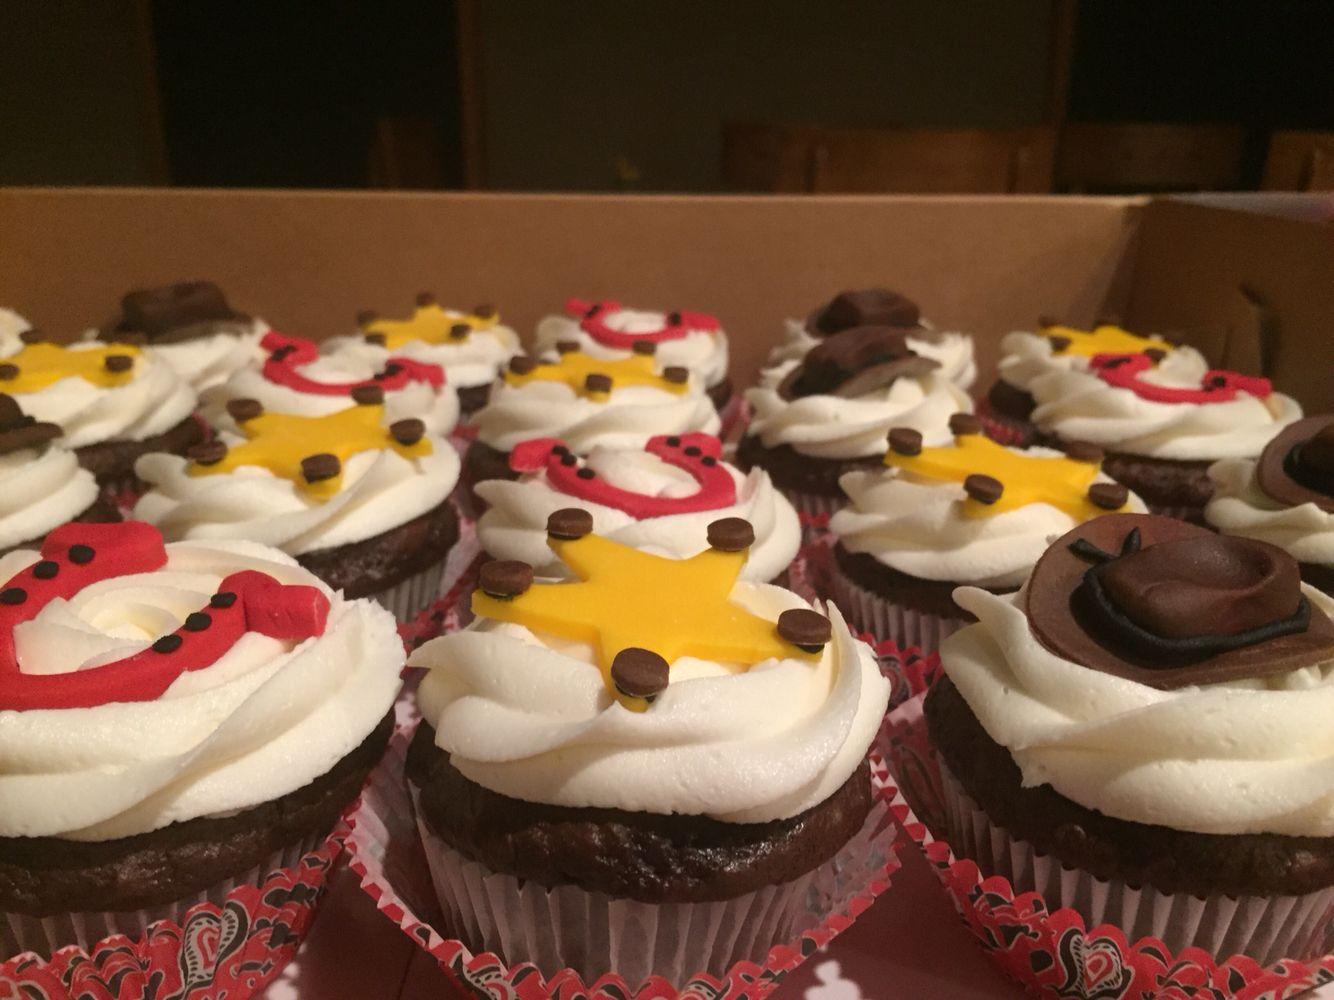 Western cupcakes